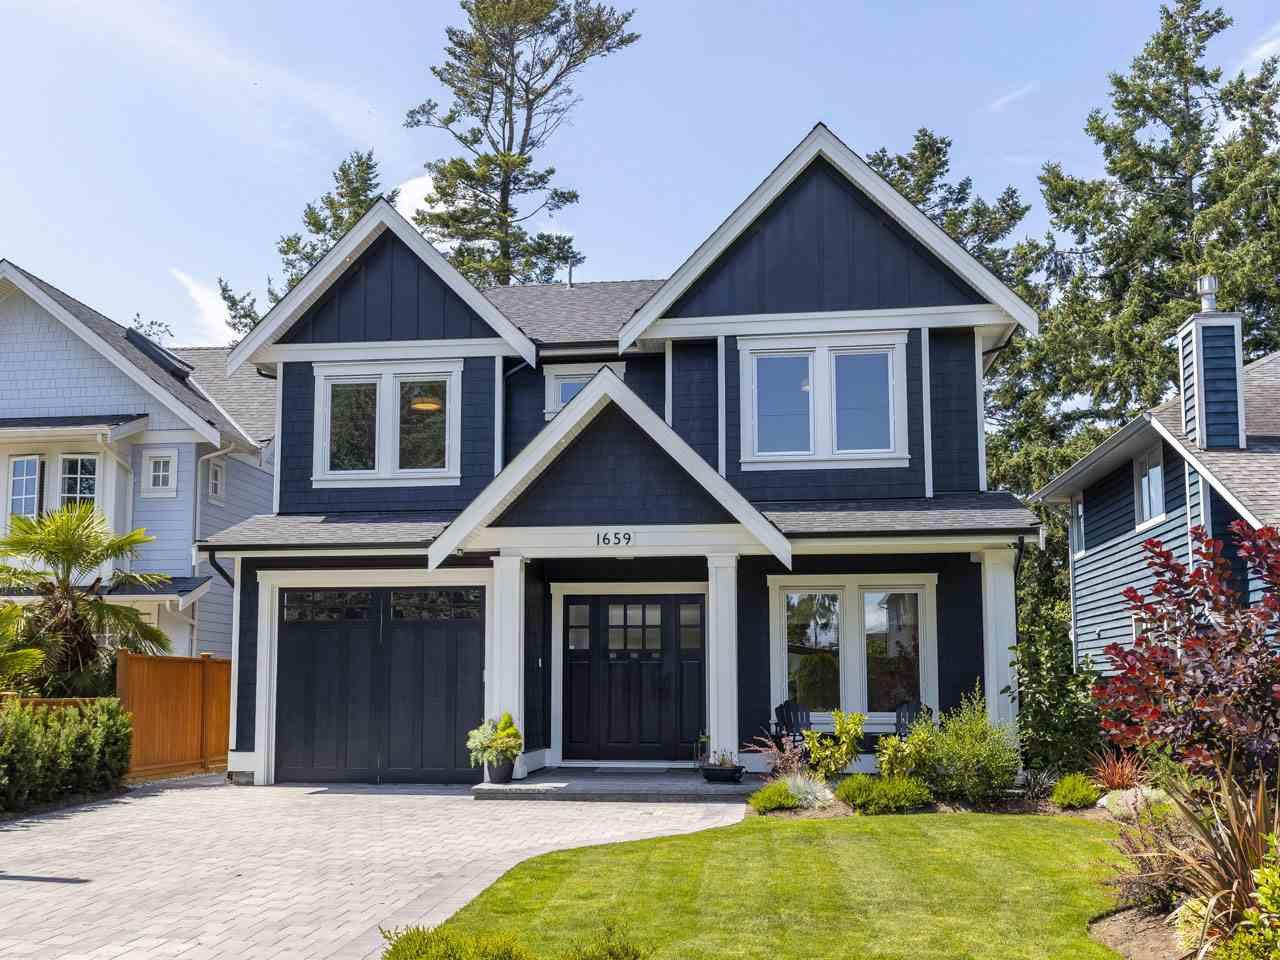 Main Photo: 1659 DUNCAN Drive in Delta: Beach Grove House for sale (Tsawwassen)  : MLS®# R2407630